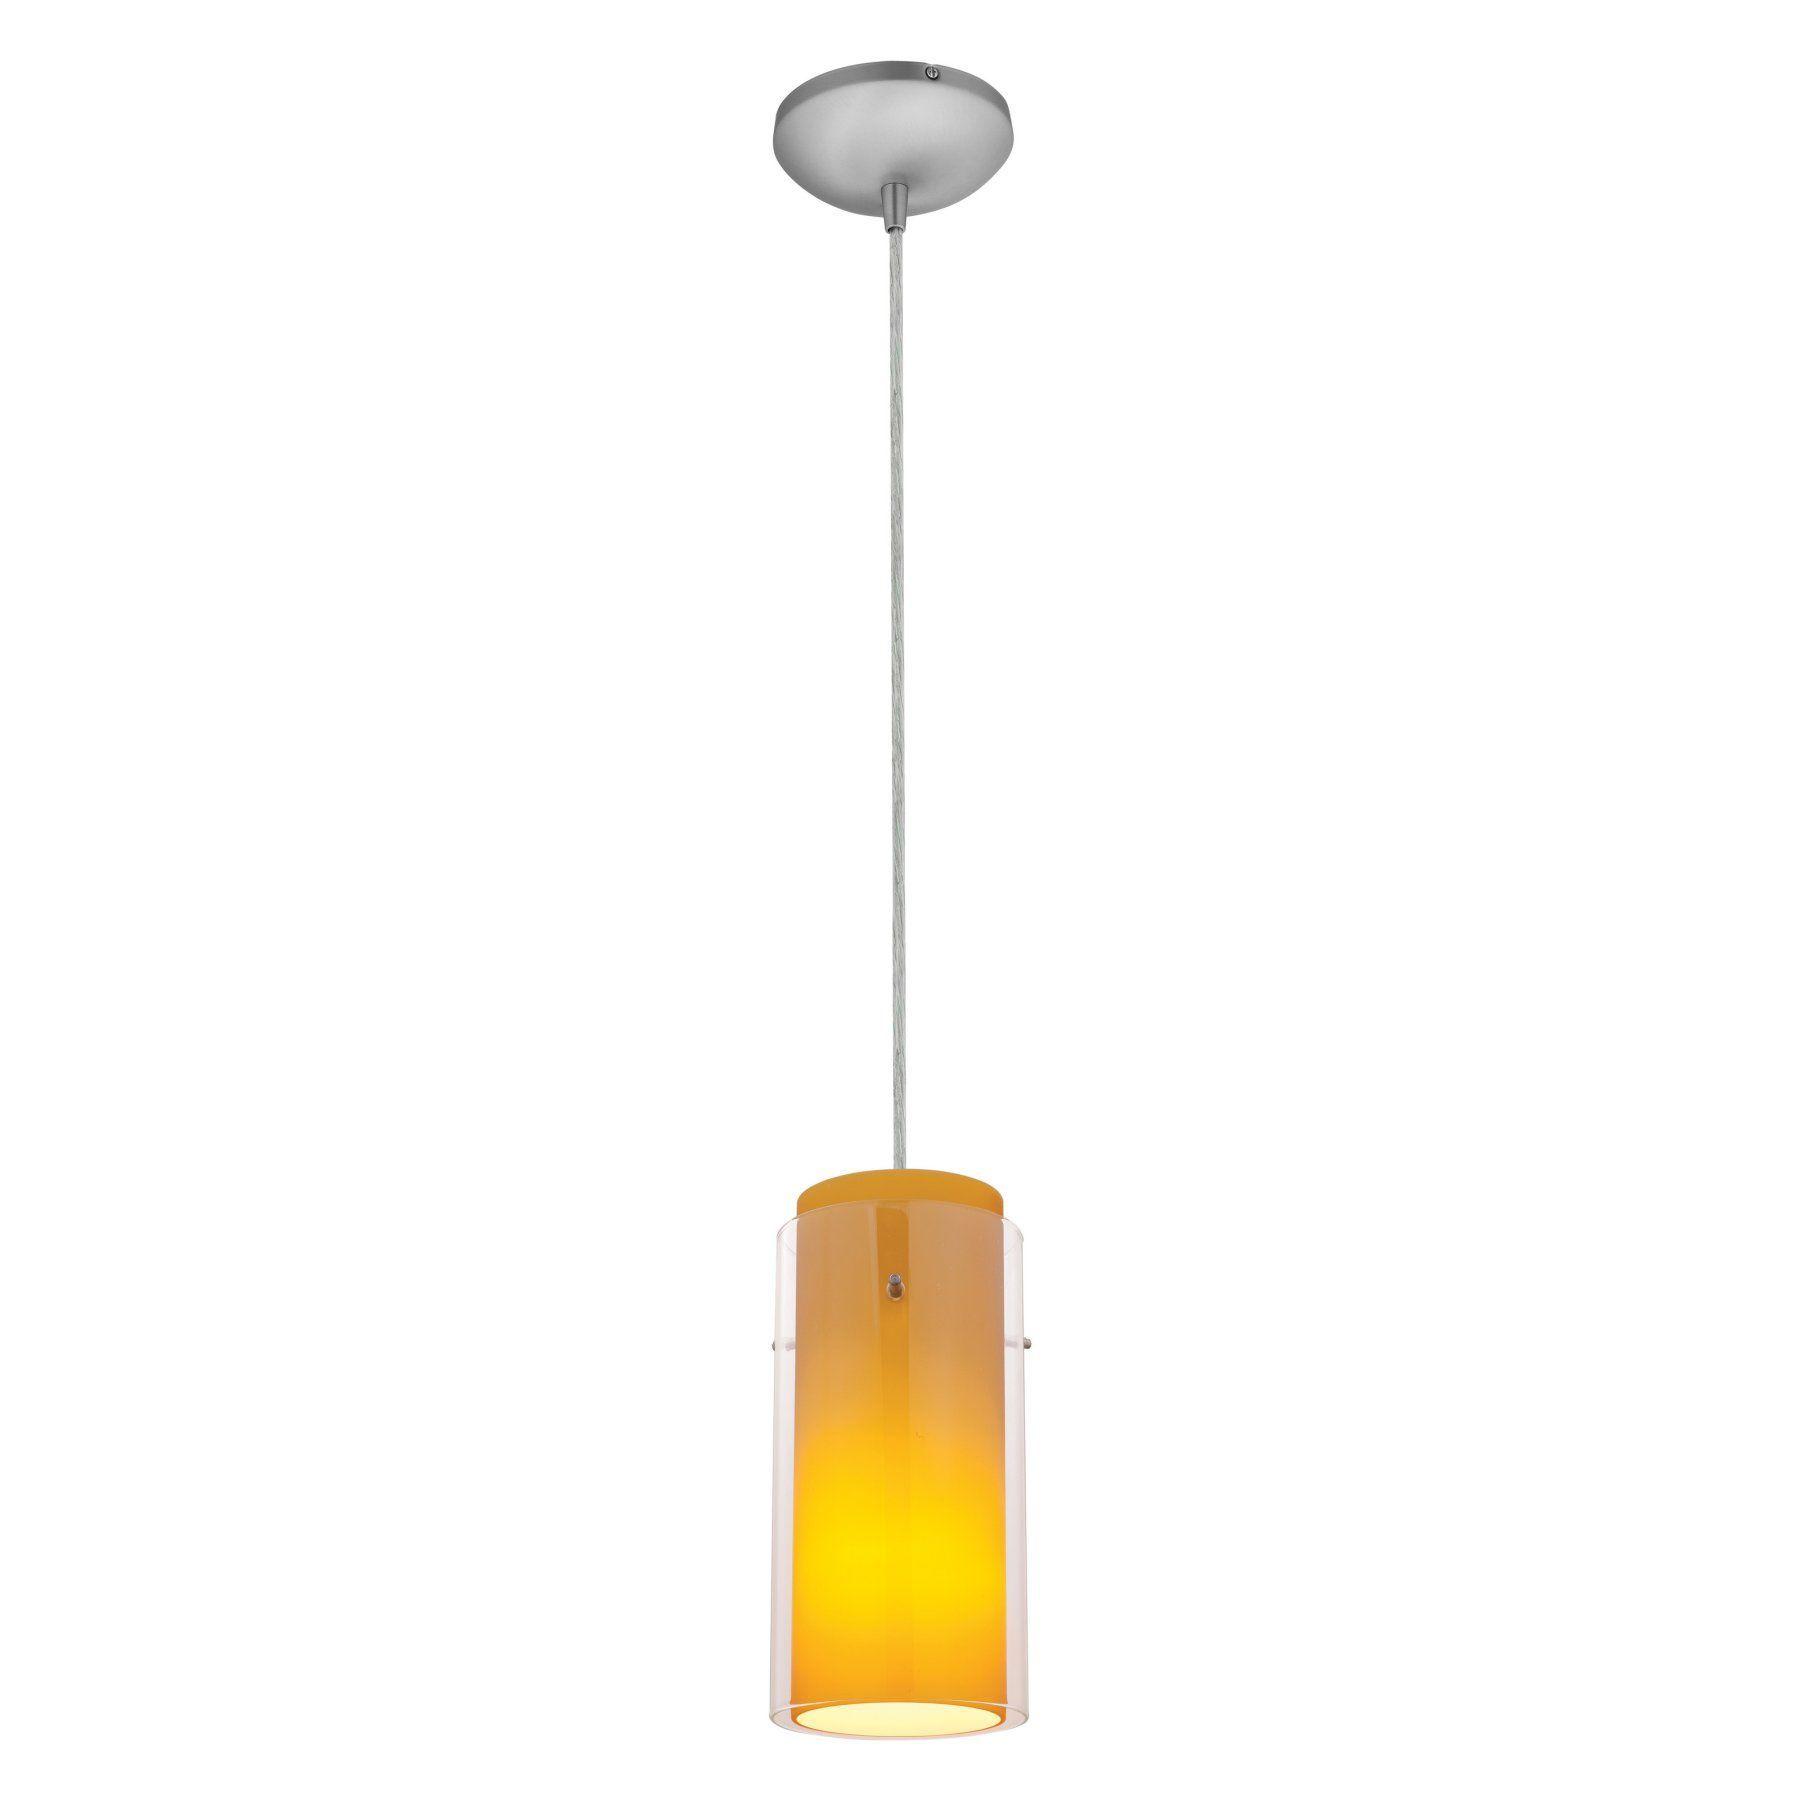 Access lighting glass n glass cylinder 28033 3c pendant light access lighting glass n glass cylinder 28033 3c pendant light 28033 3c aloadofball Choice Image